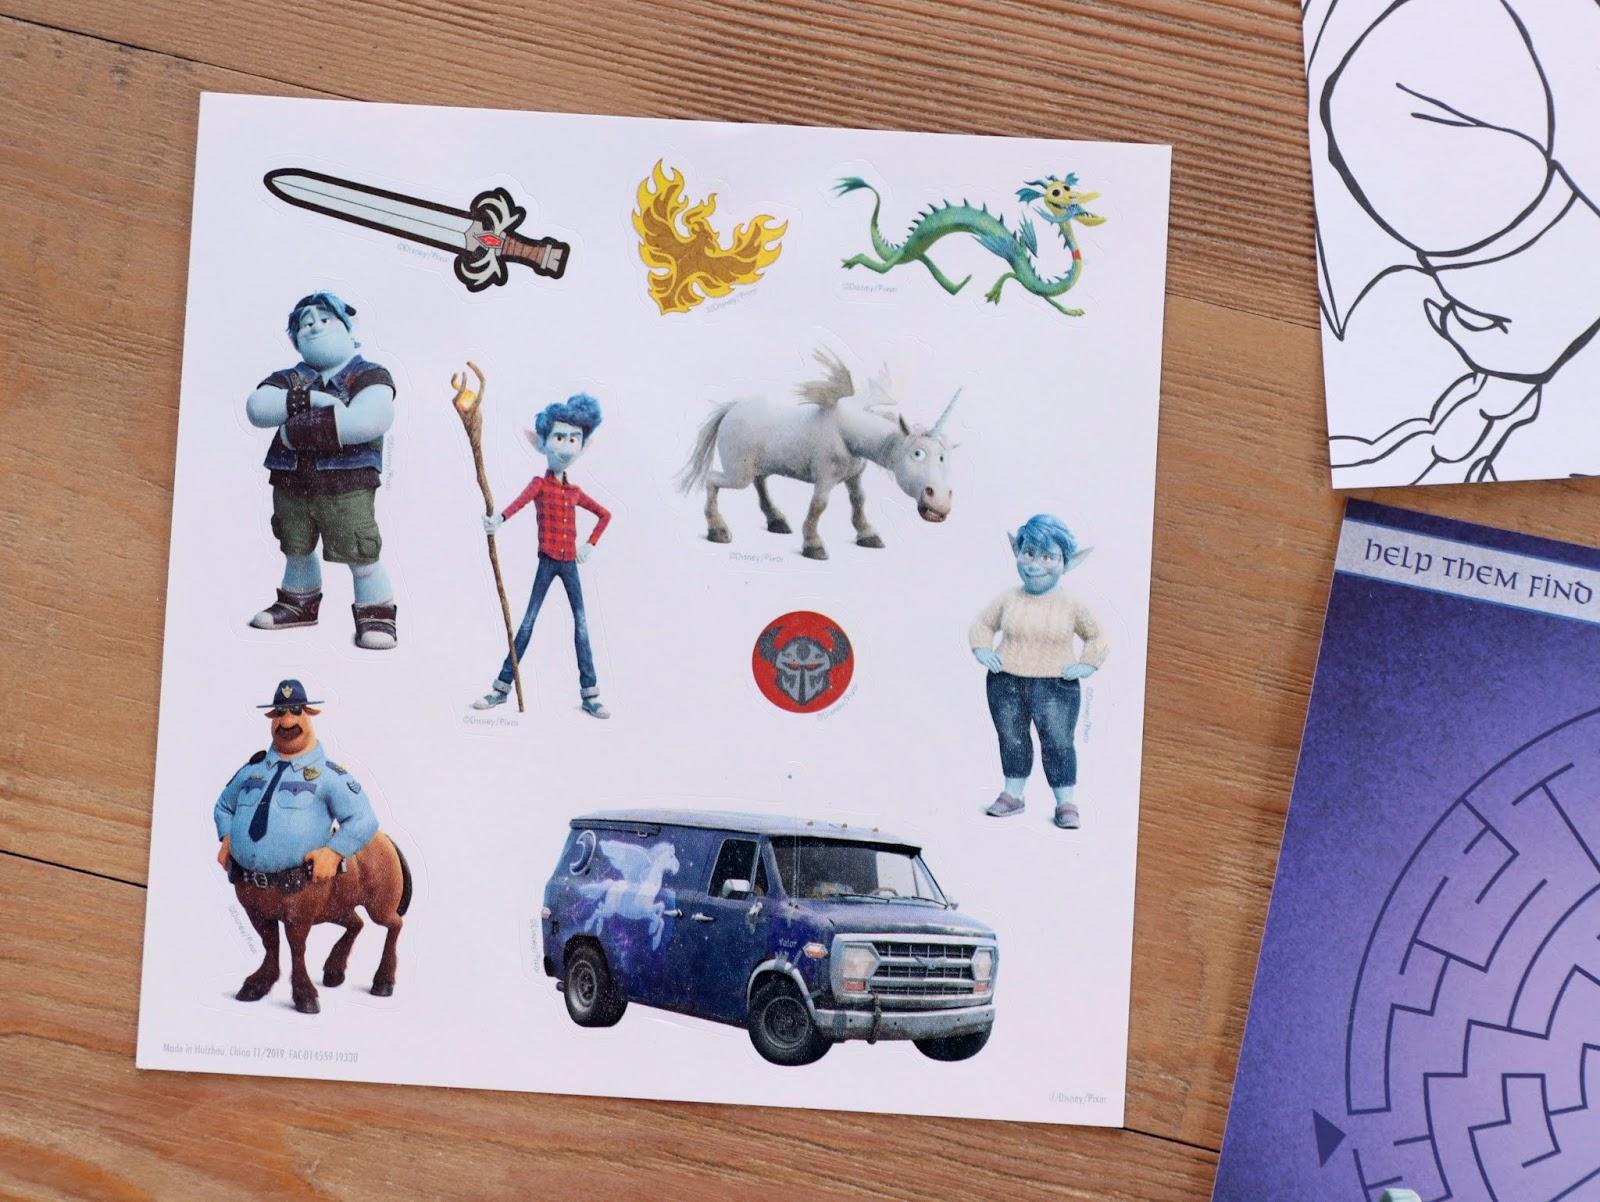 Pixar Onward Disney Store Event Activity Set